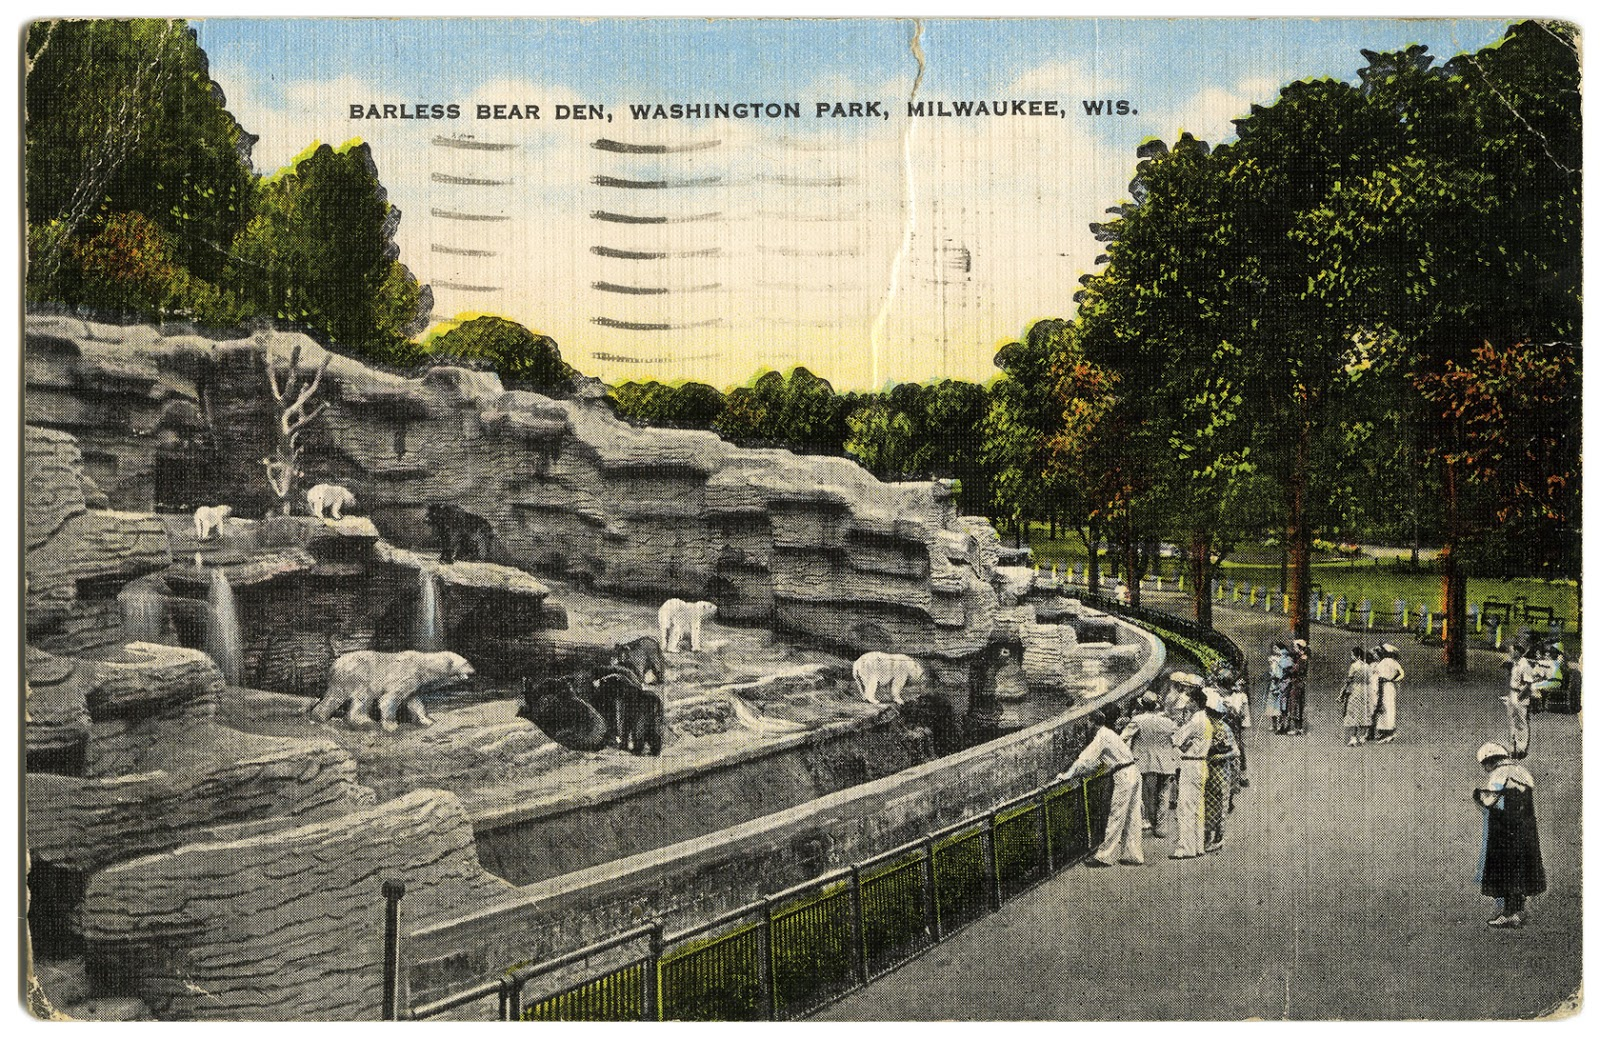 The wisconsin project found barless bear den milwaukee wi - Washington park swimming pool milwaukee ...